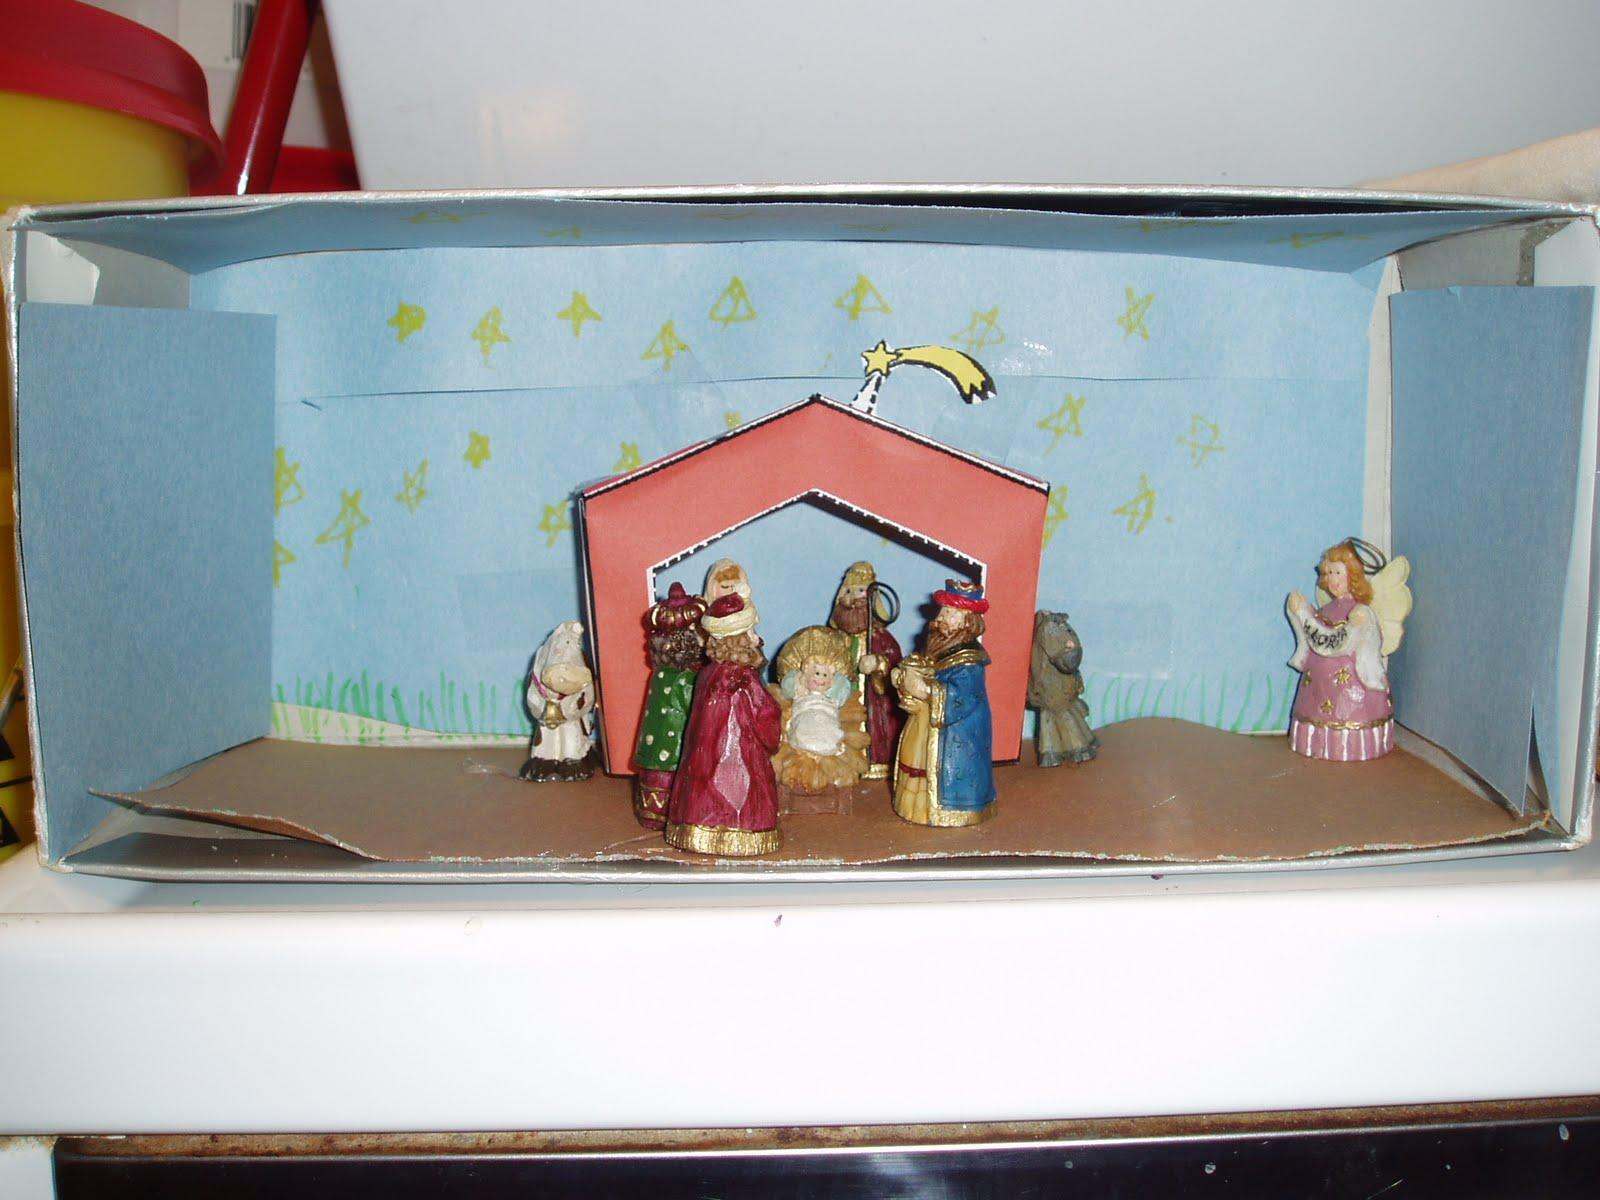 Christmas Shoebox Diorama.5 Too Many Christmas Around The World